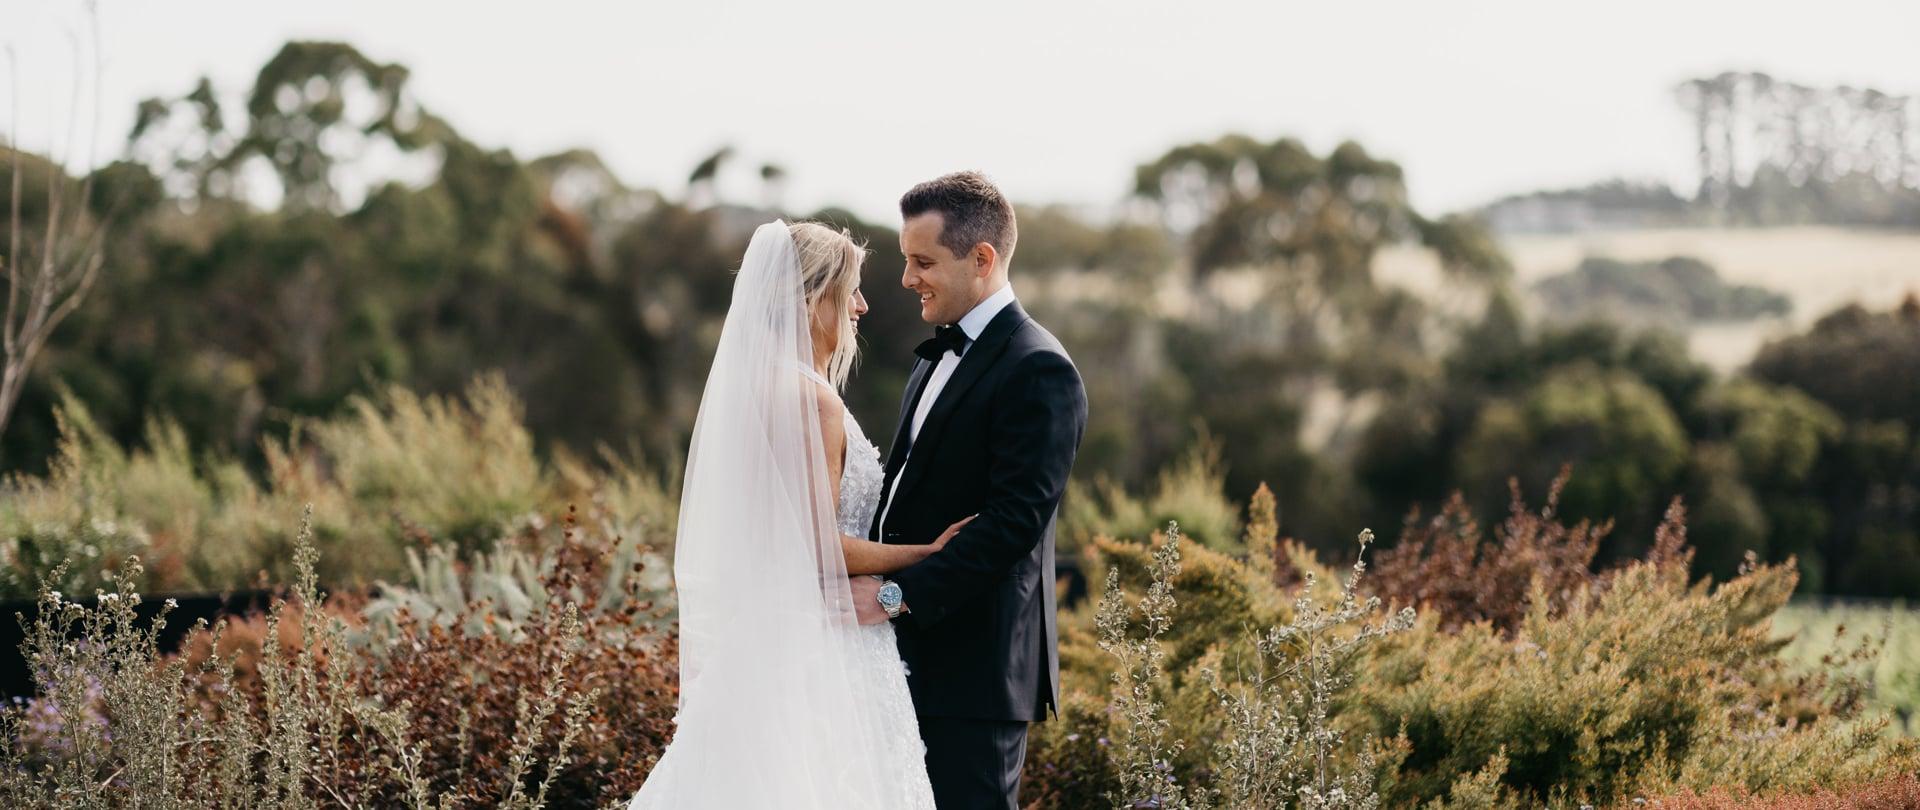 Nicole & Brodie Wedding Video Filmed at Mornington Peninsula, Victoria